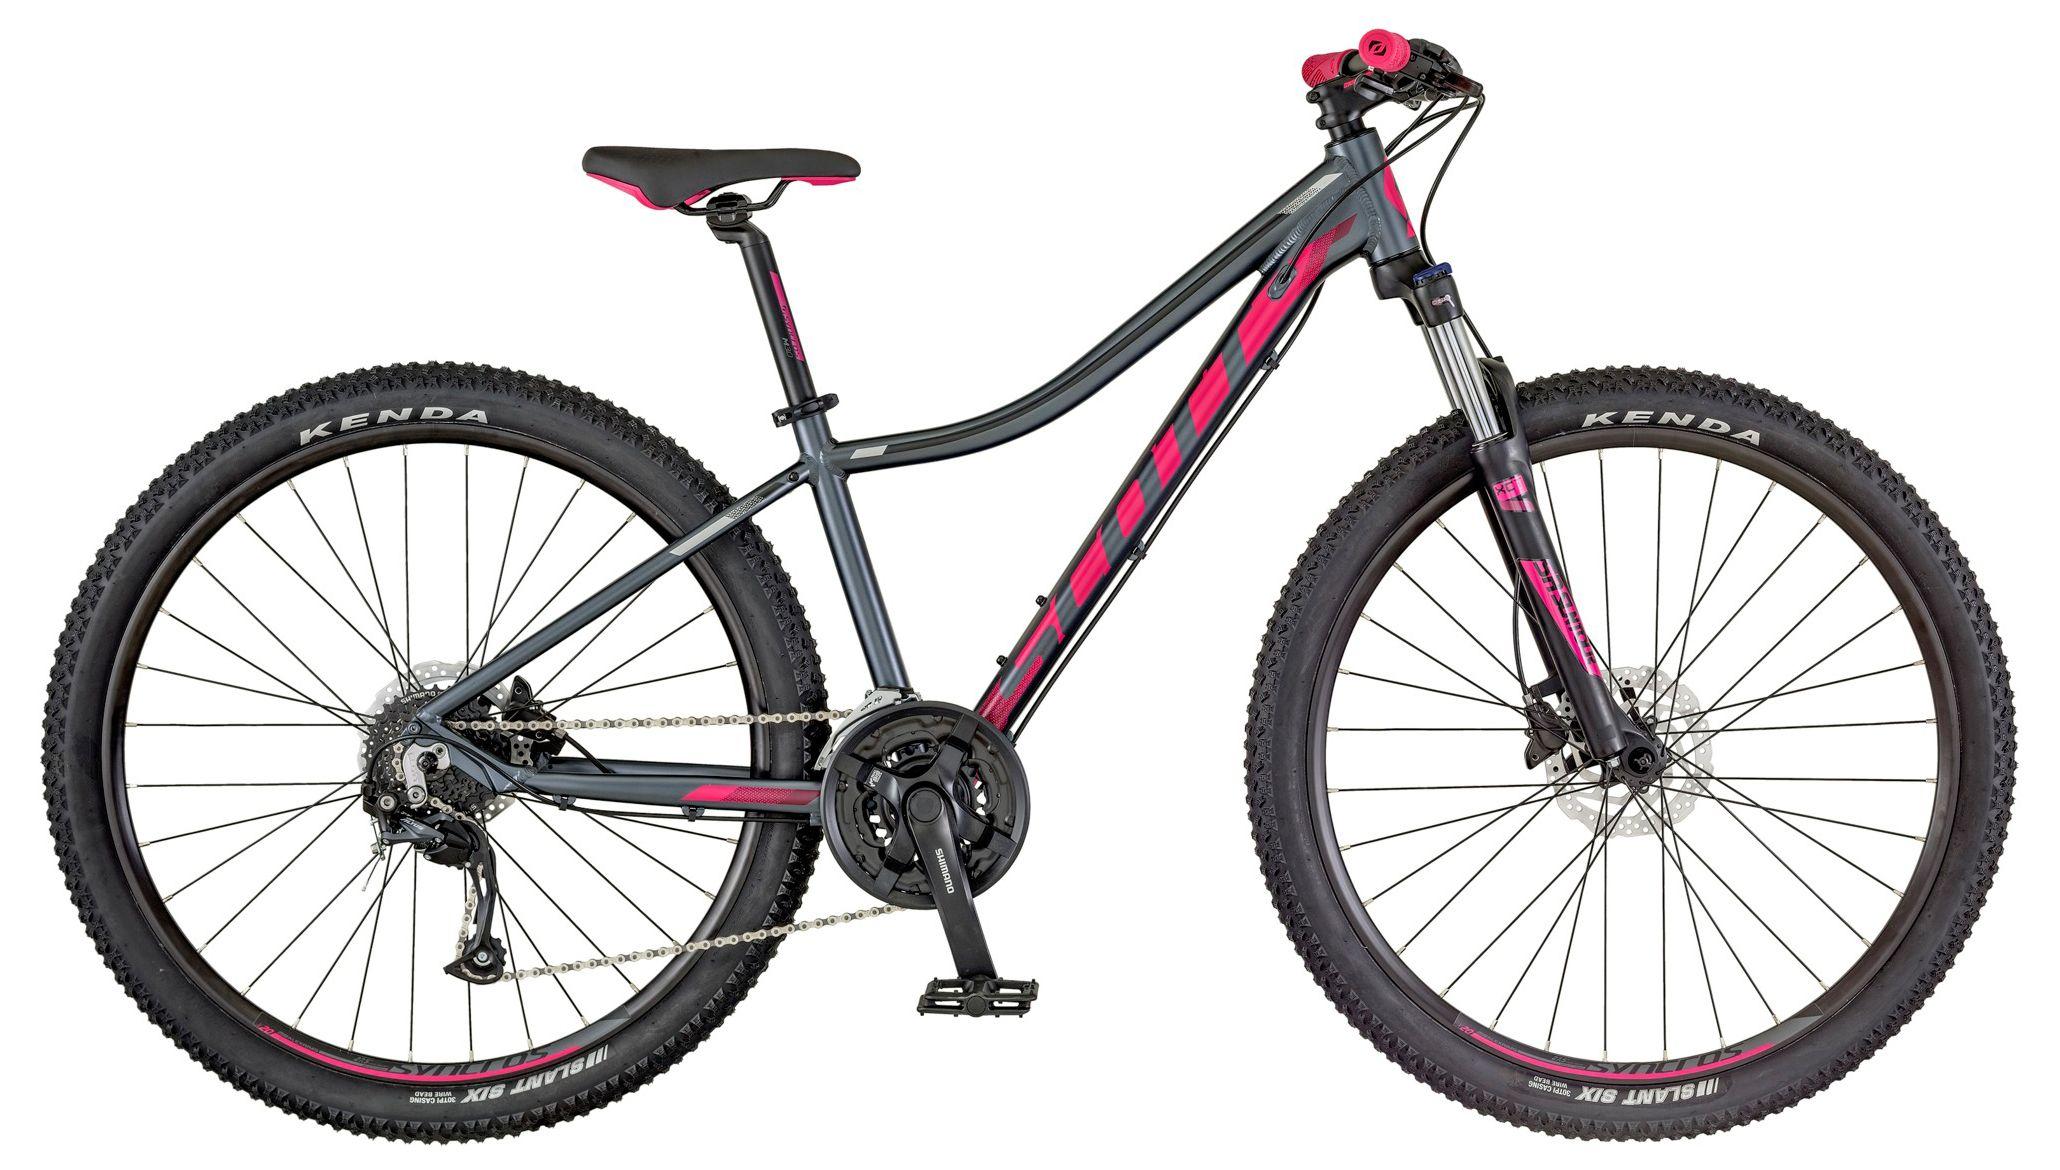 Велосипед Scott Contessa 720 2018 велосипед scott aspect 720 27 5 2016